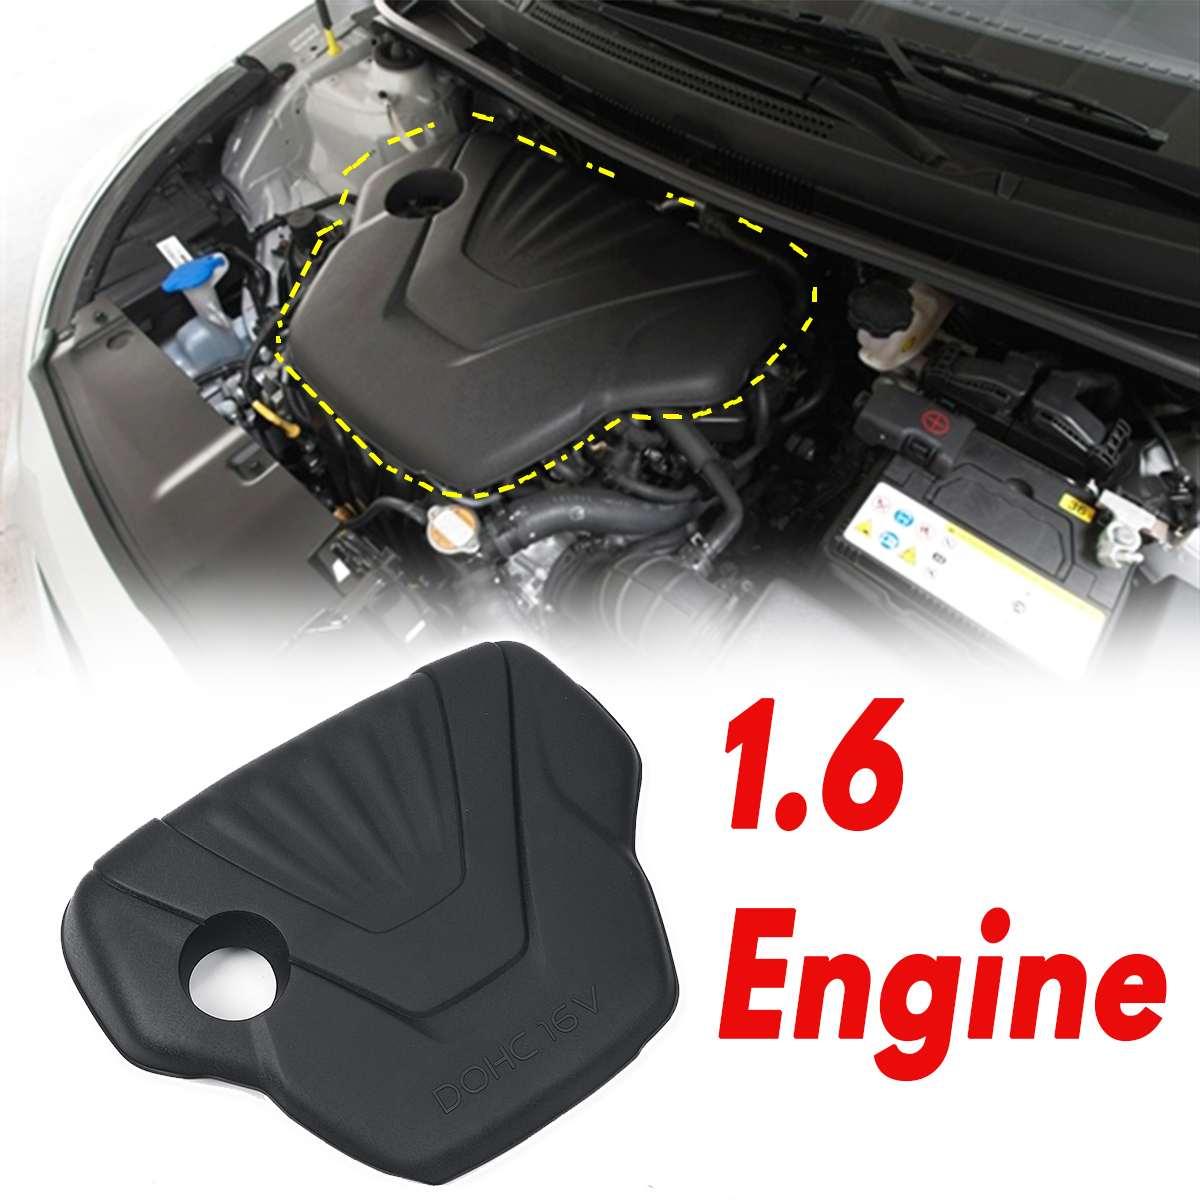 1.6L ABS крышка двигателя защитная крышка 29240 2B810 для Hyundai Creta IX25 Accent Veloster для KIA SOUL RIO|Крышки двигателя|   | АлиЭкспресс